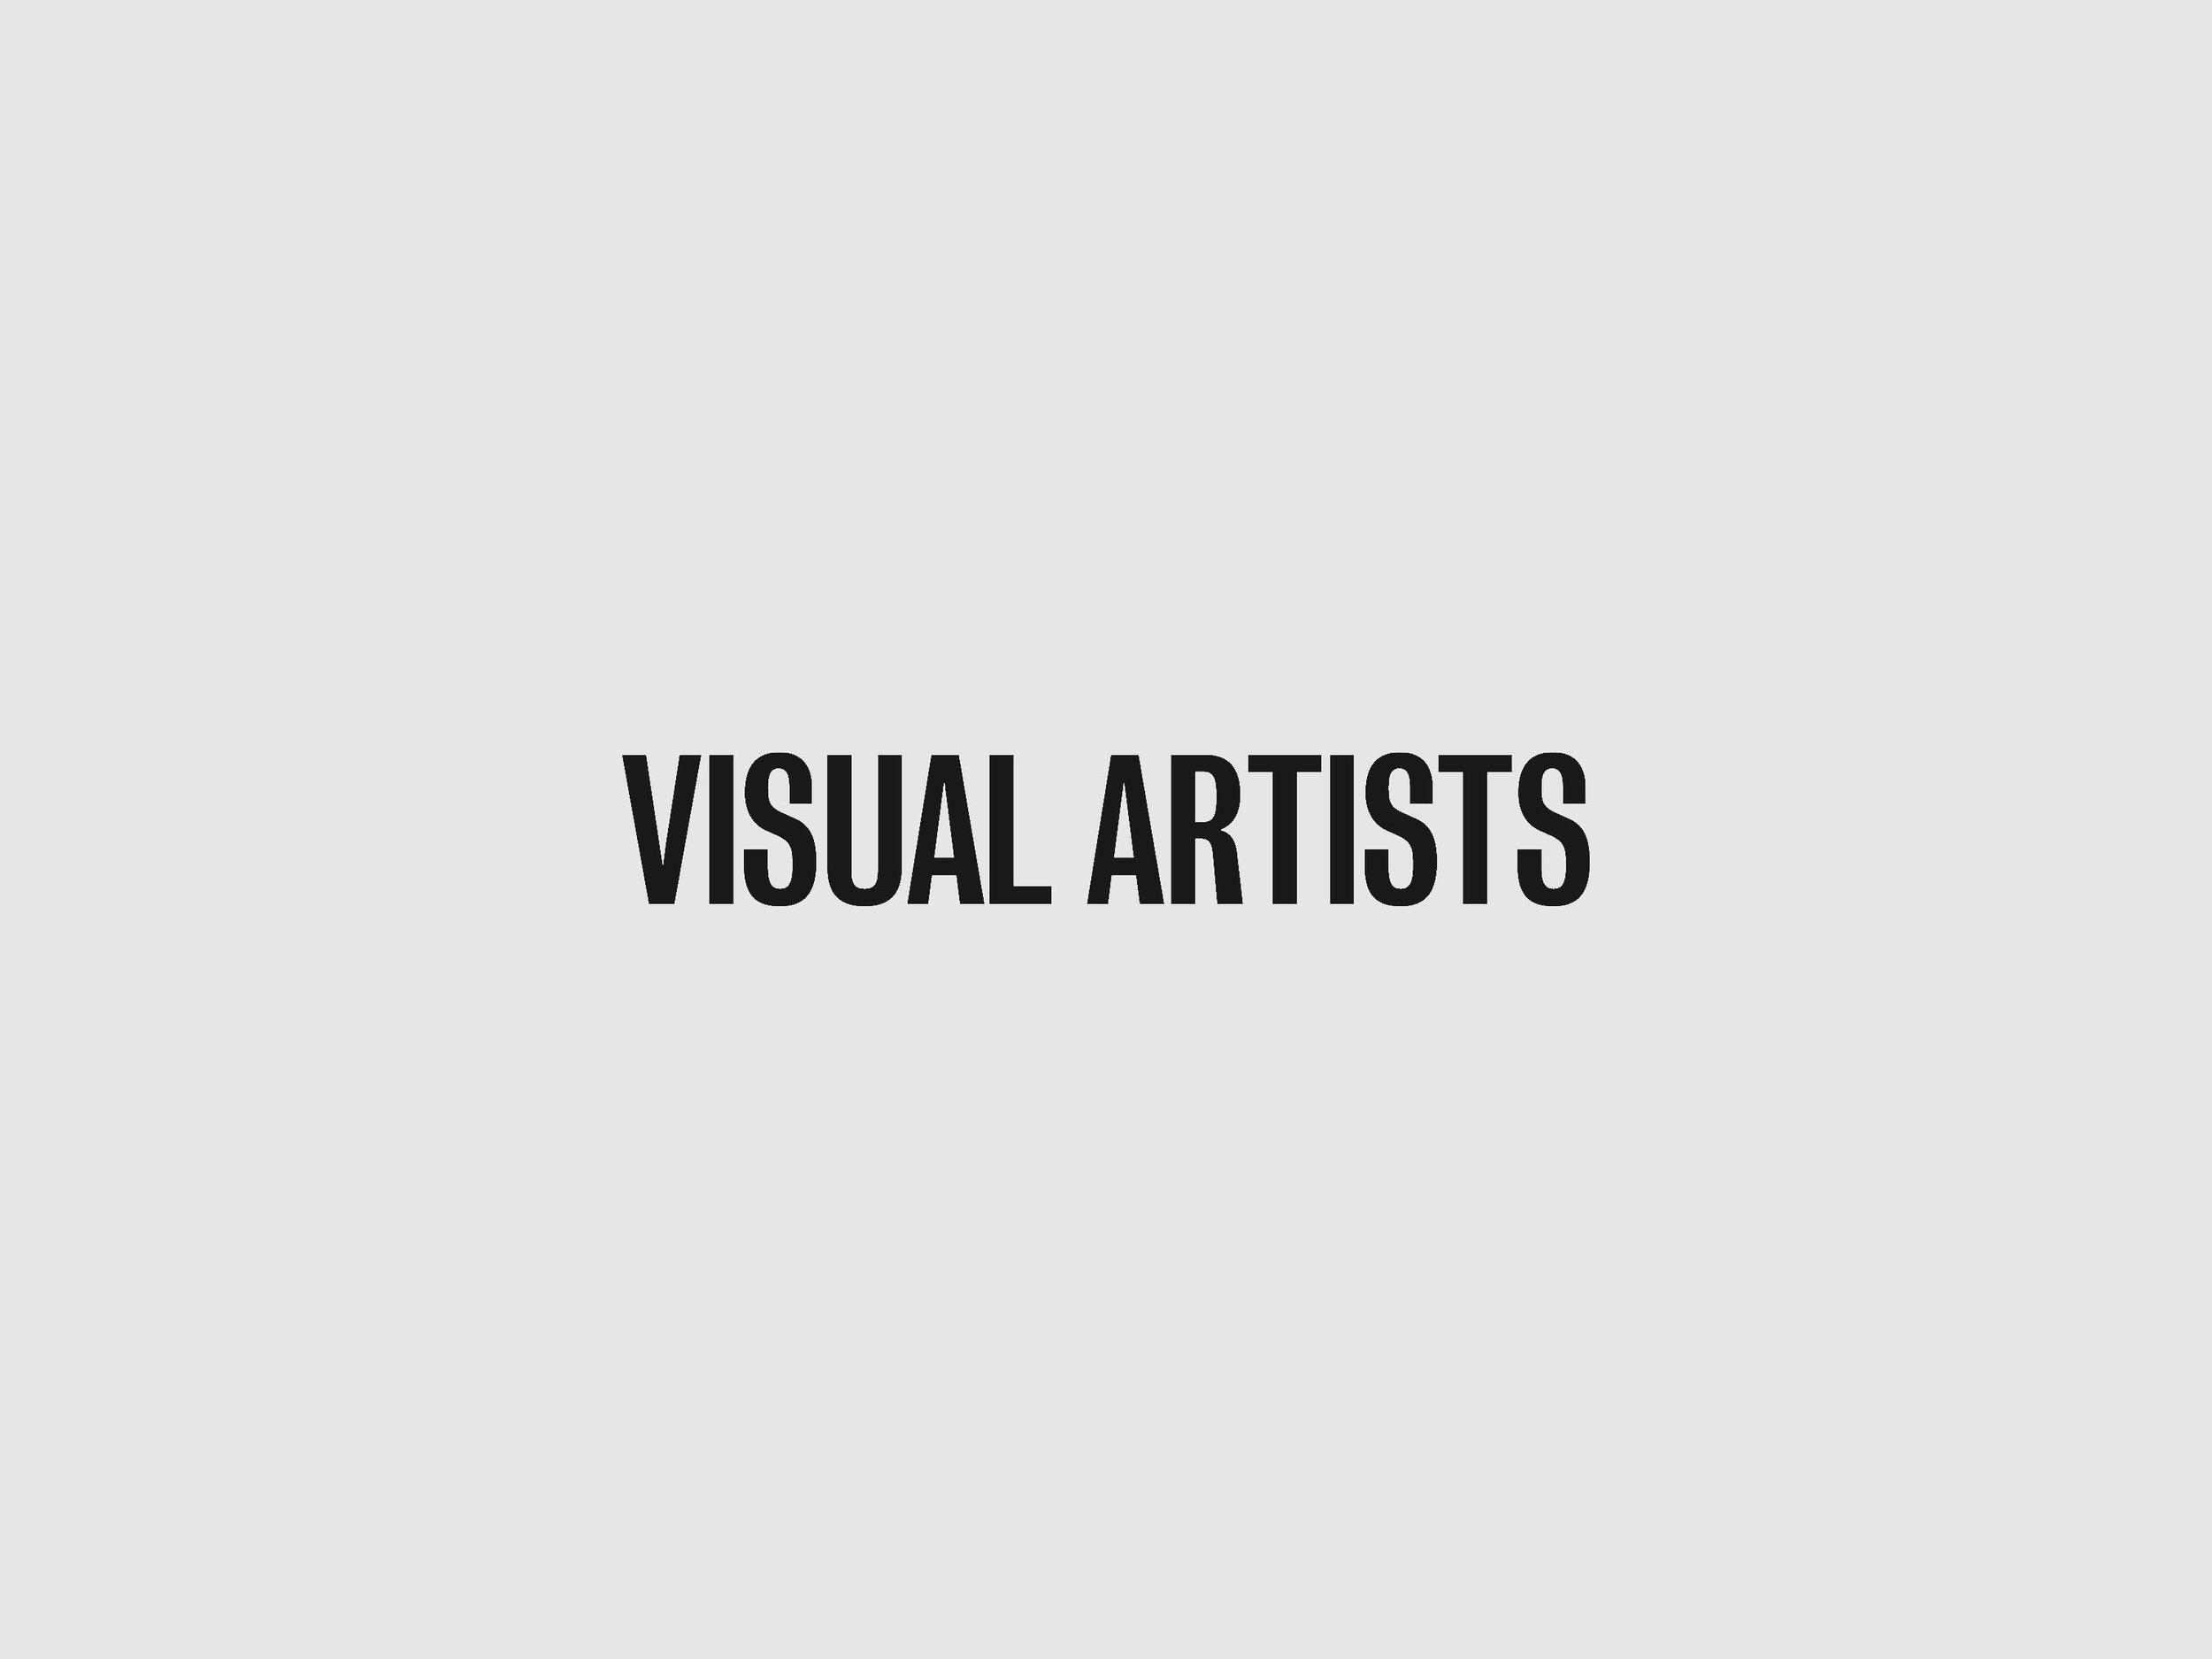 Visual-Artists_01.jpg